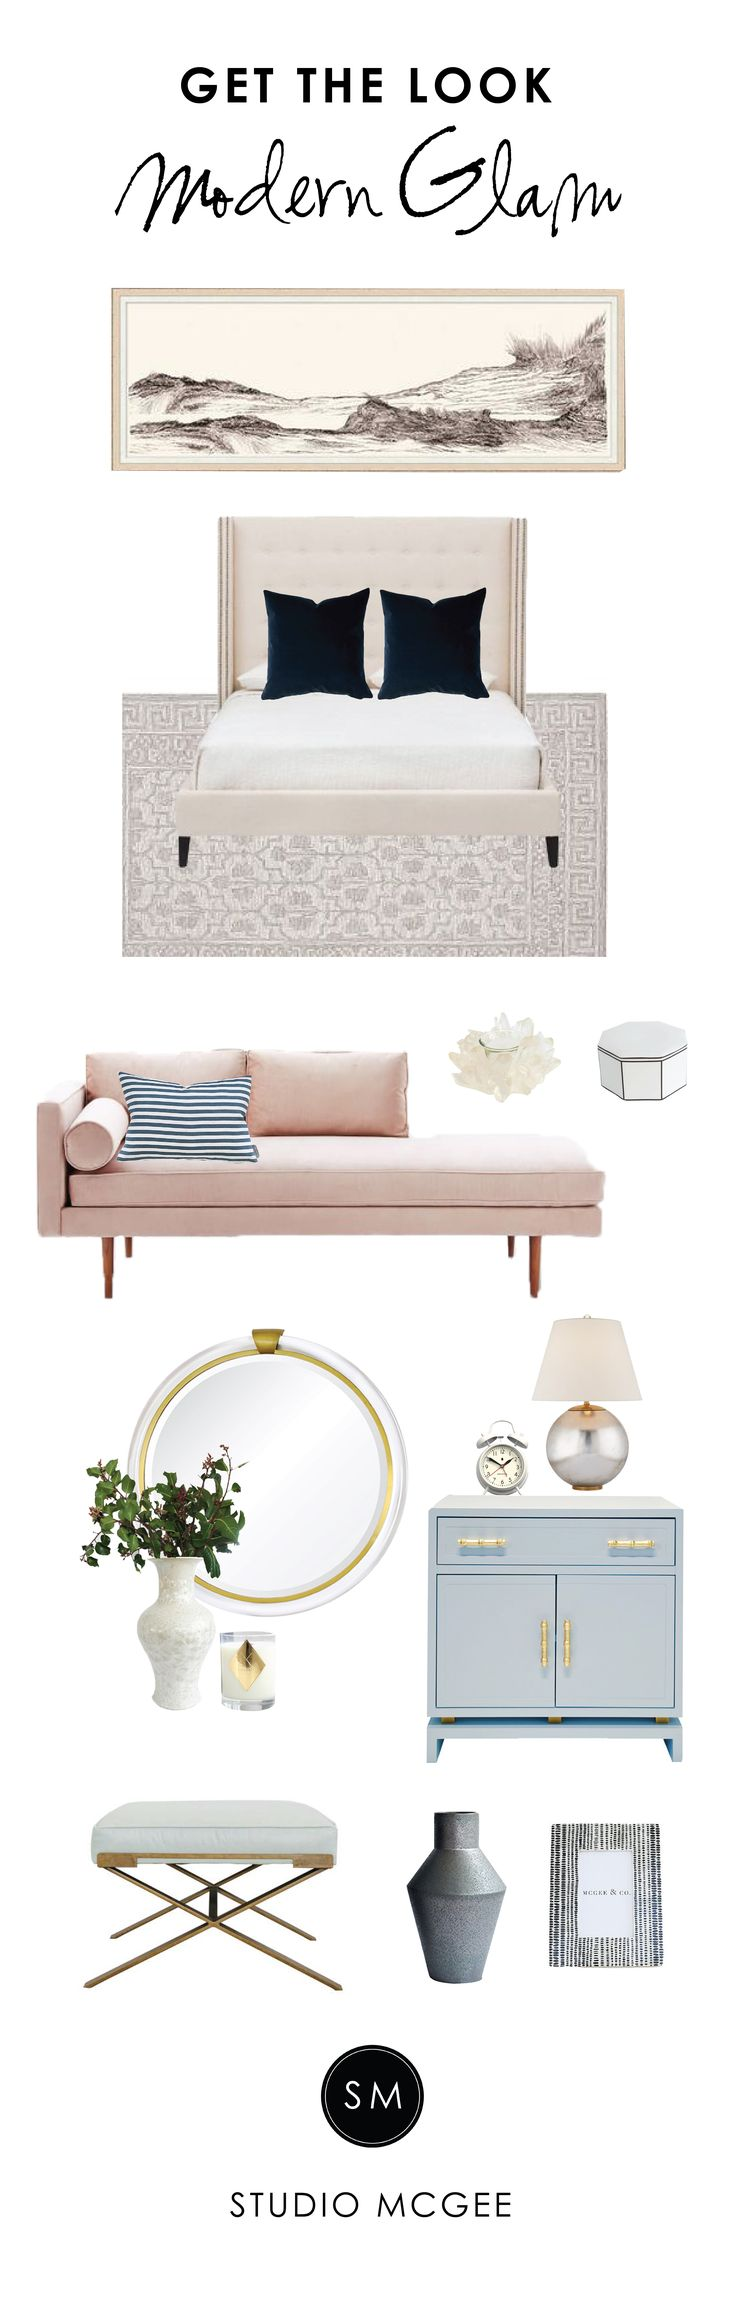 Get the Look: Modern Glam Bedroom - Studio McGee